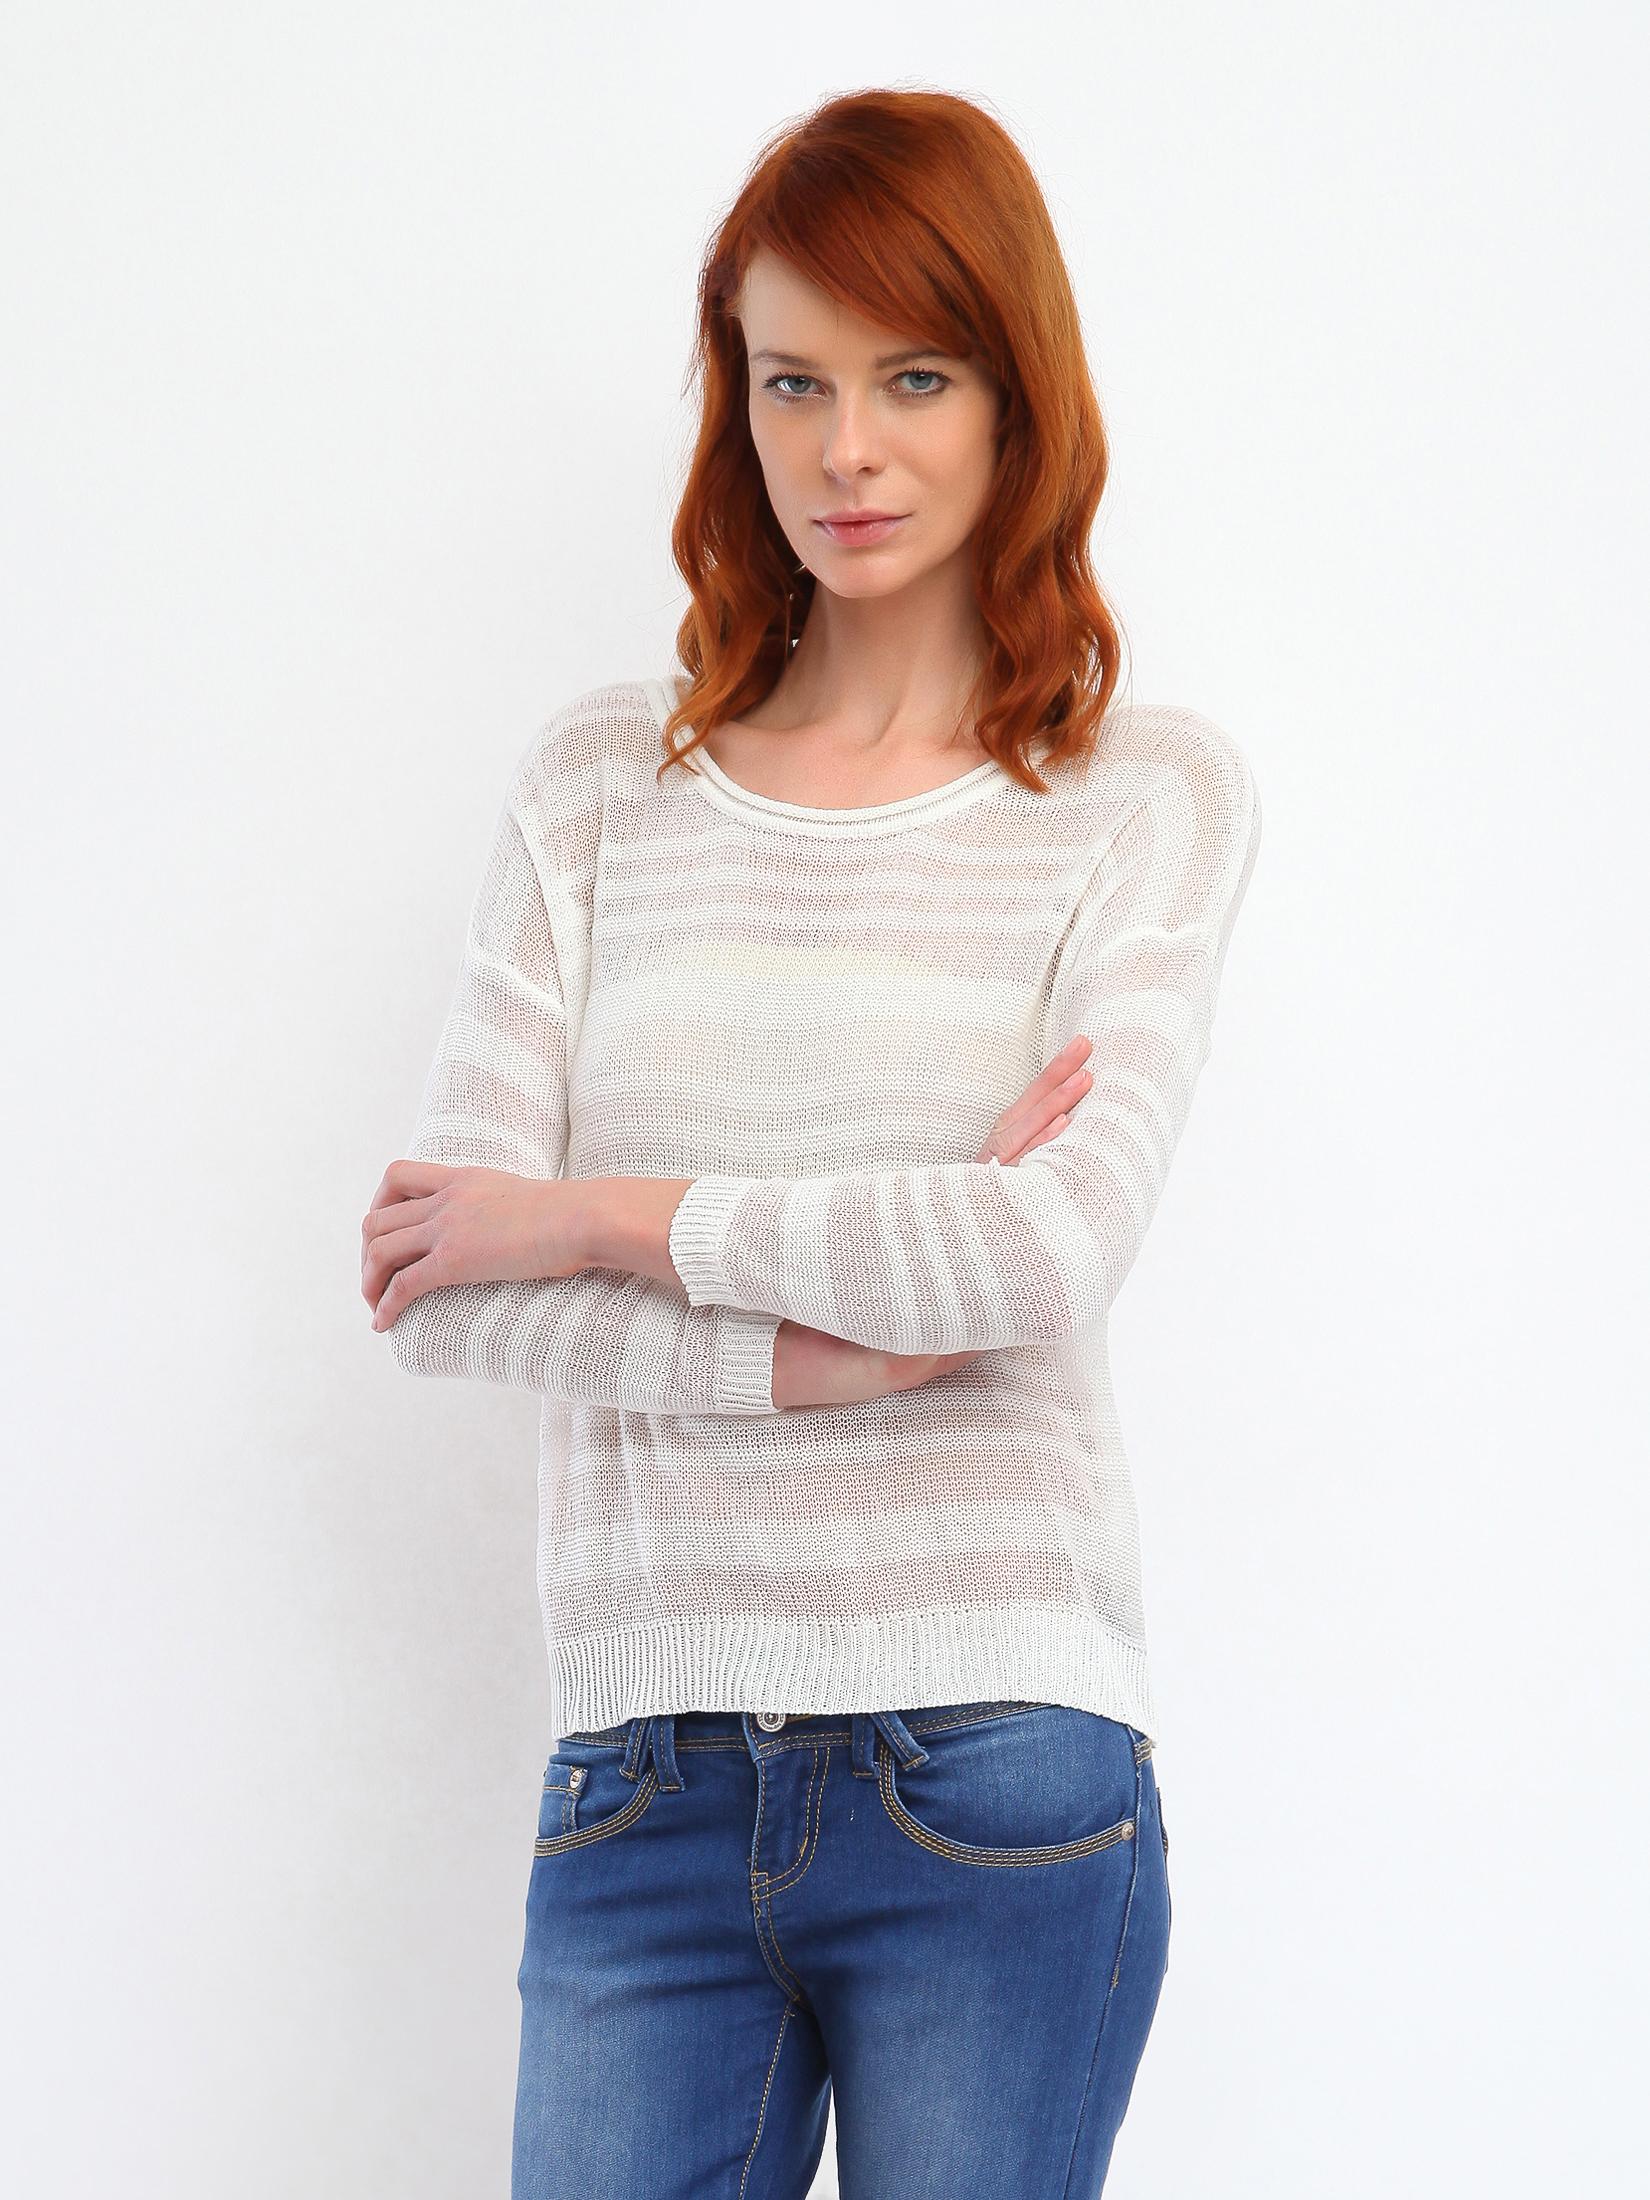 Top Secret S026815 White Sweater